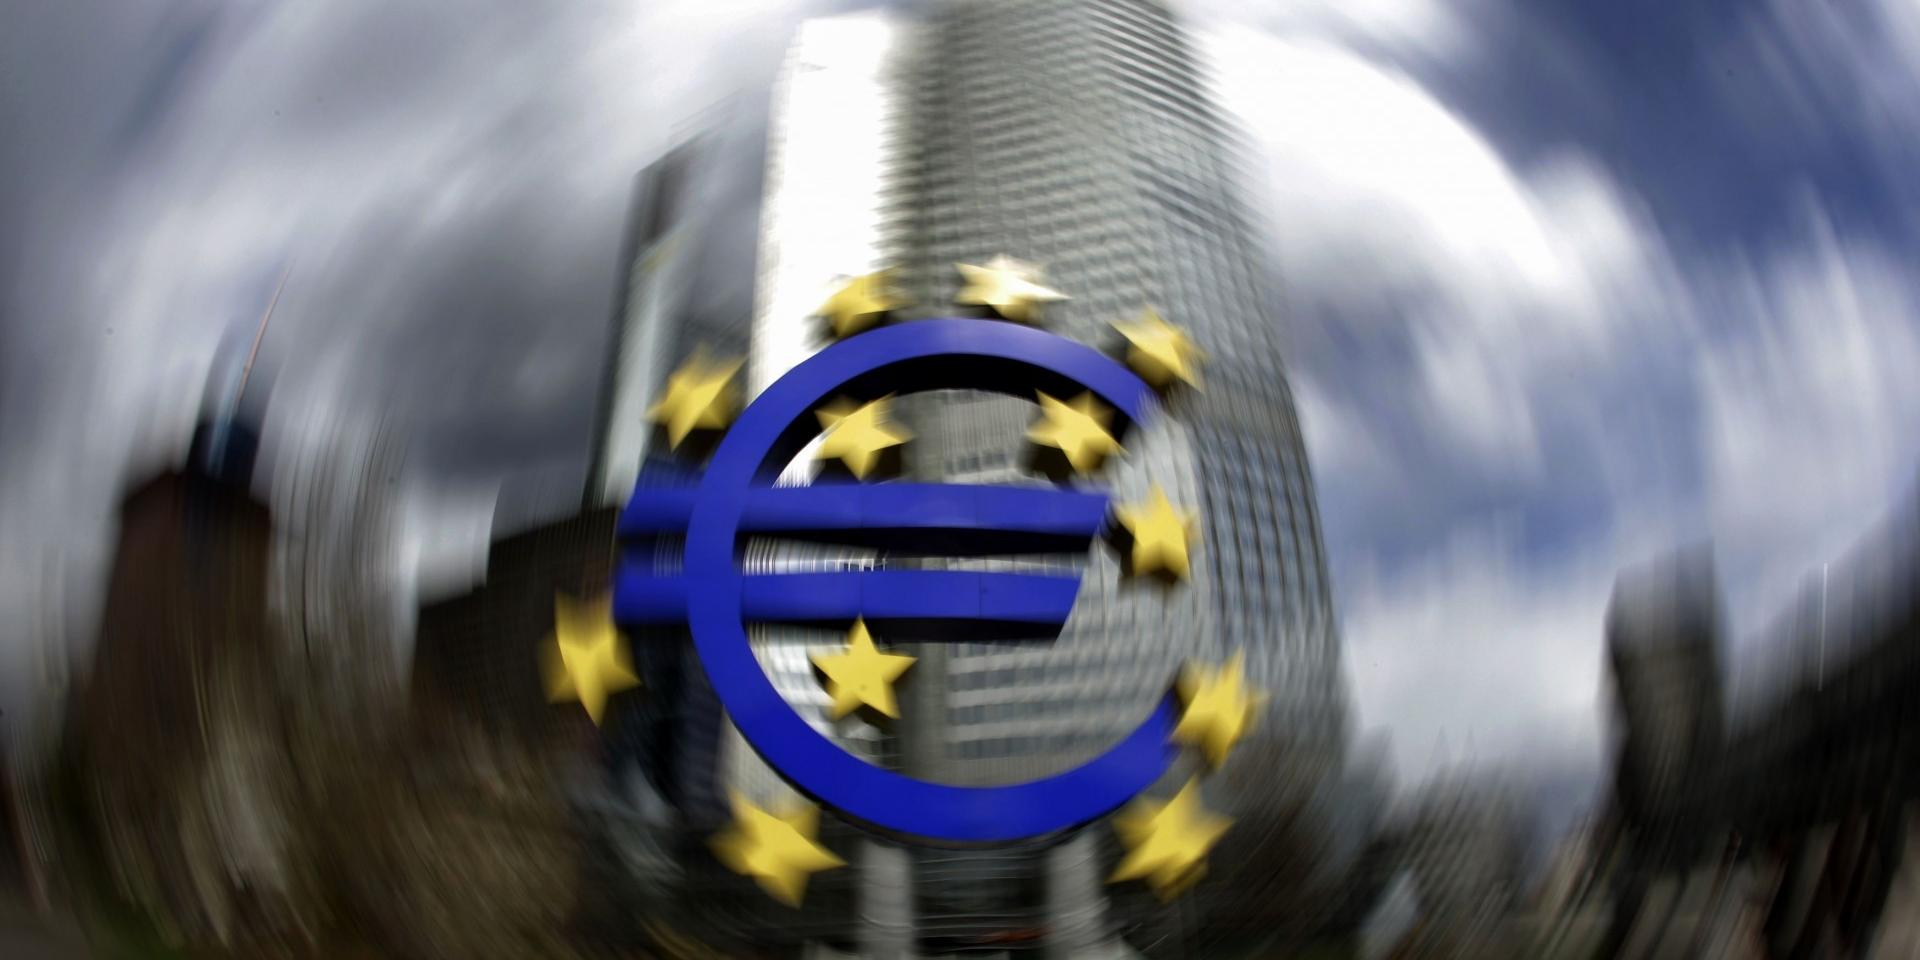 euro-tourbillon